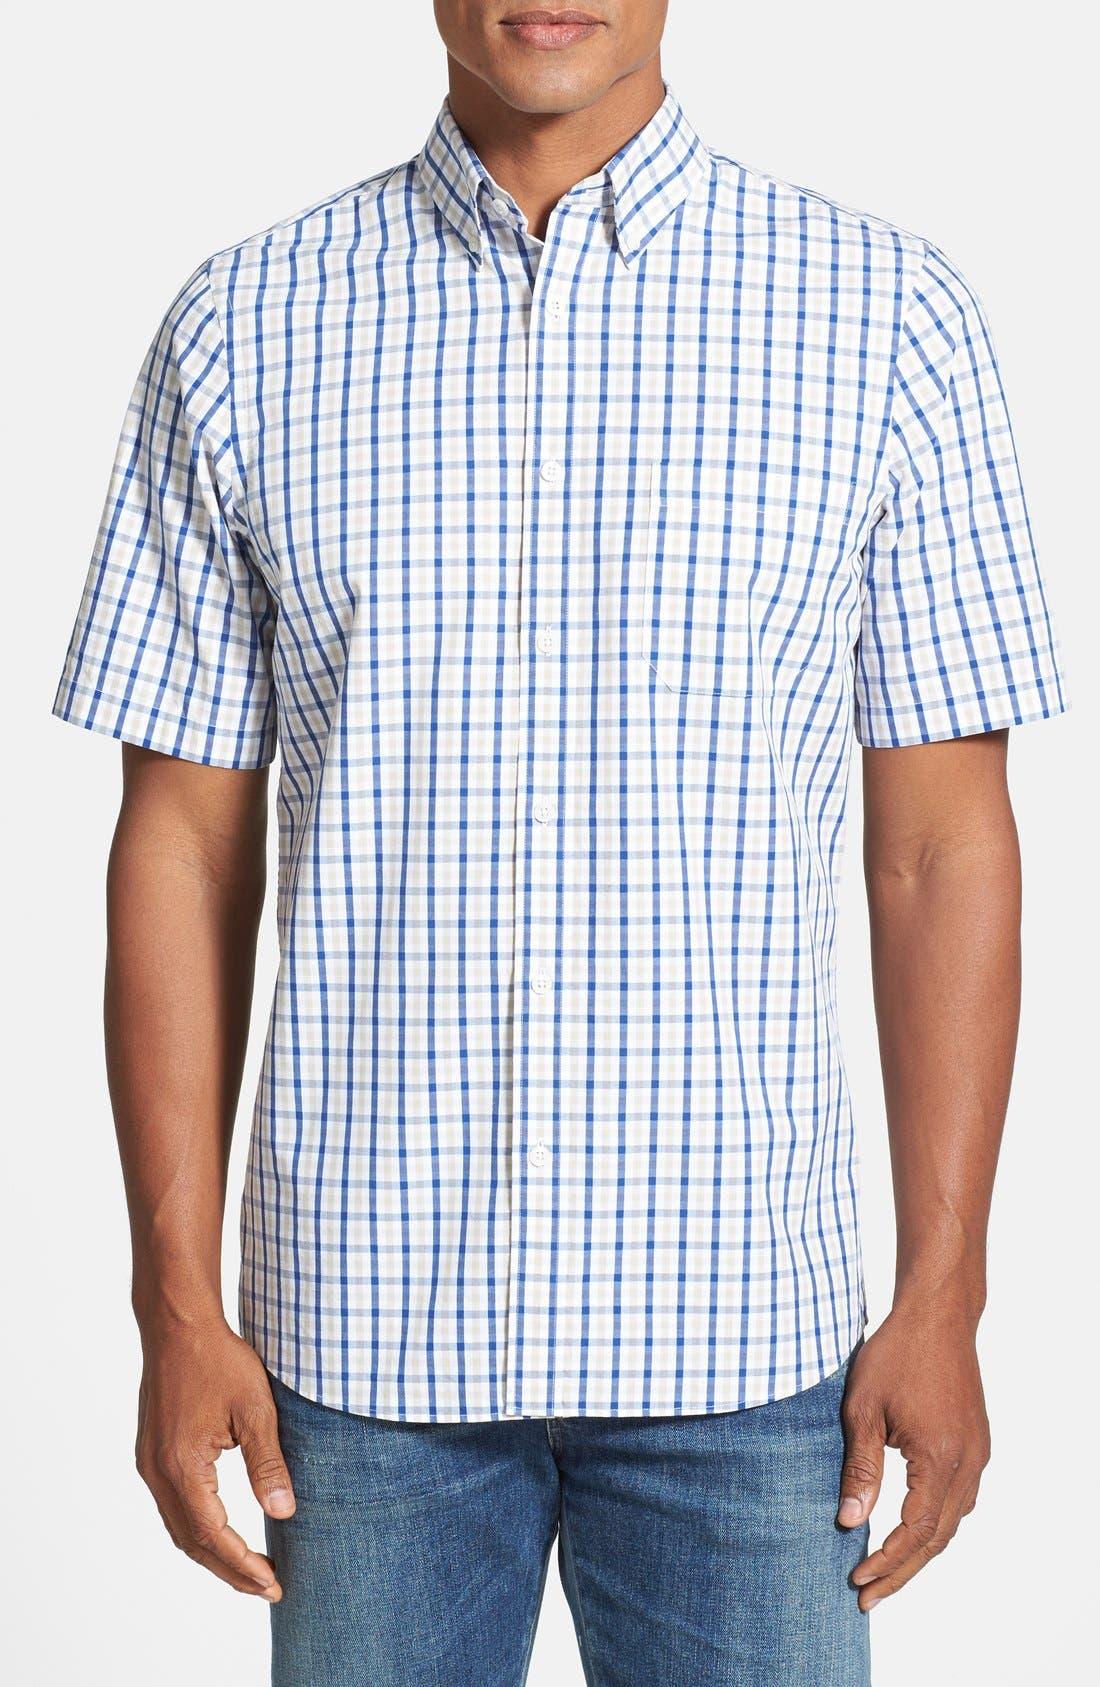 Main Image - Nordstrom Regular Fit Short Sleeve Woven Sport Shirt